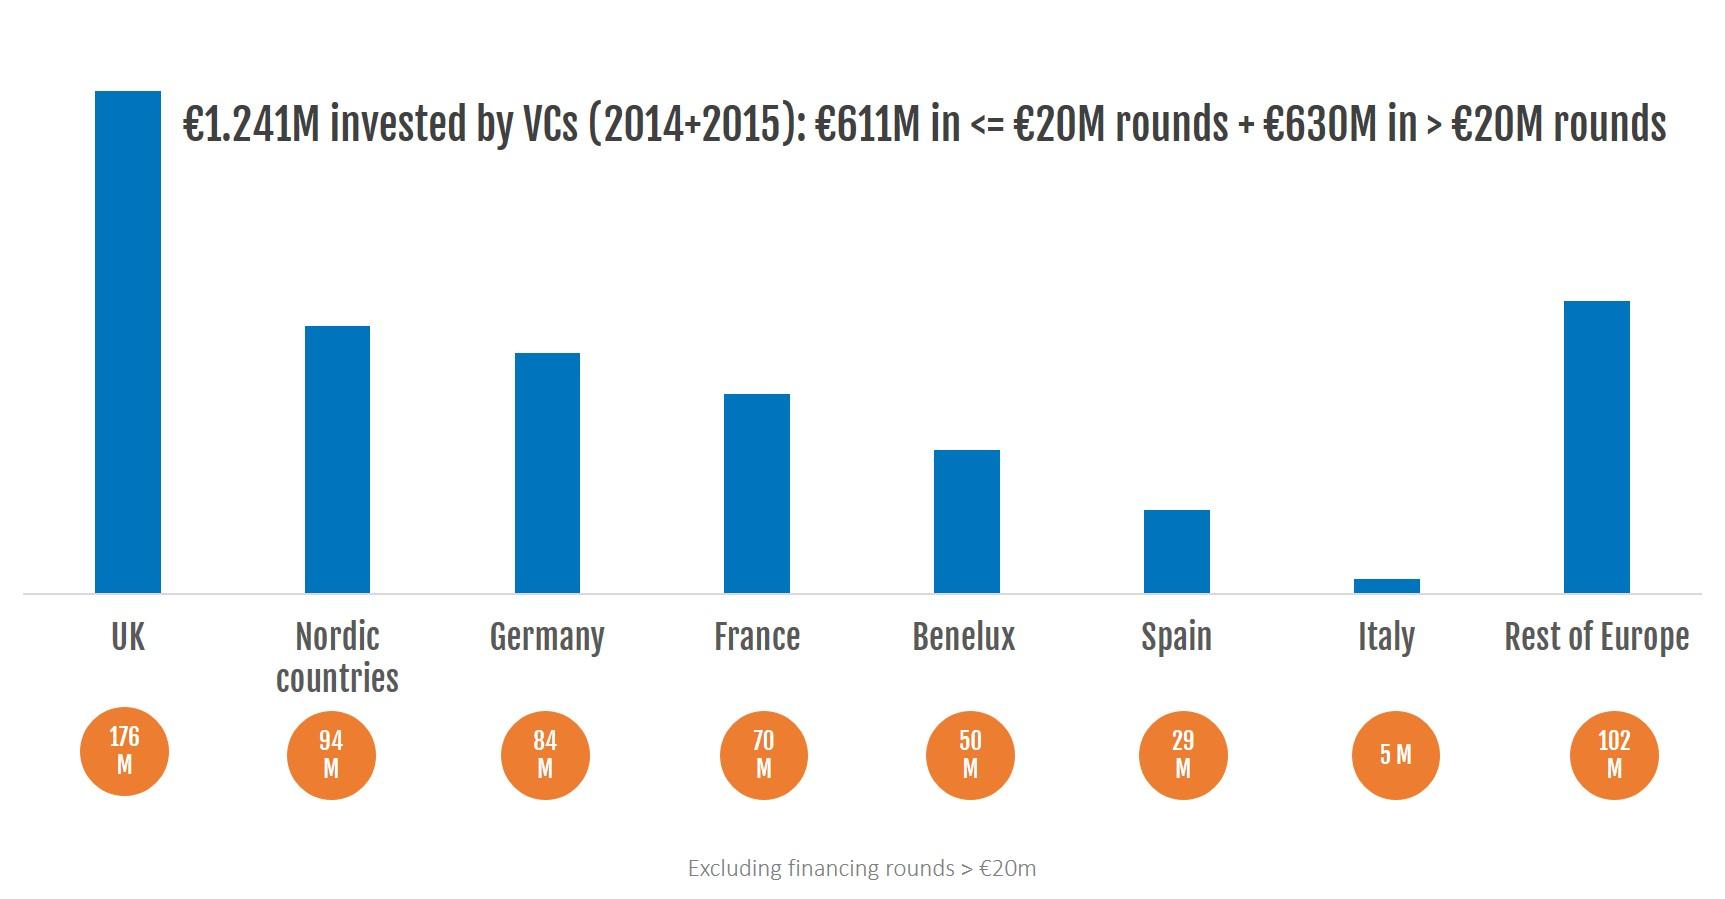 4-investments-data-startups-geographic-distribution-amount-2_no-logo